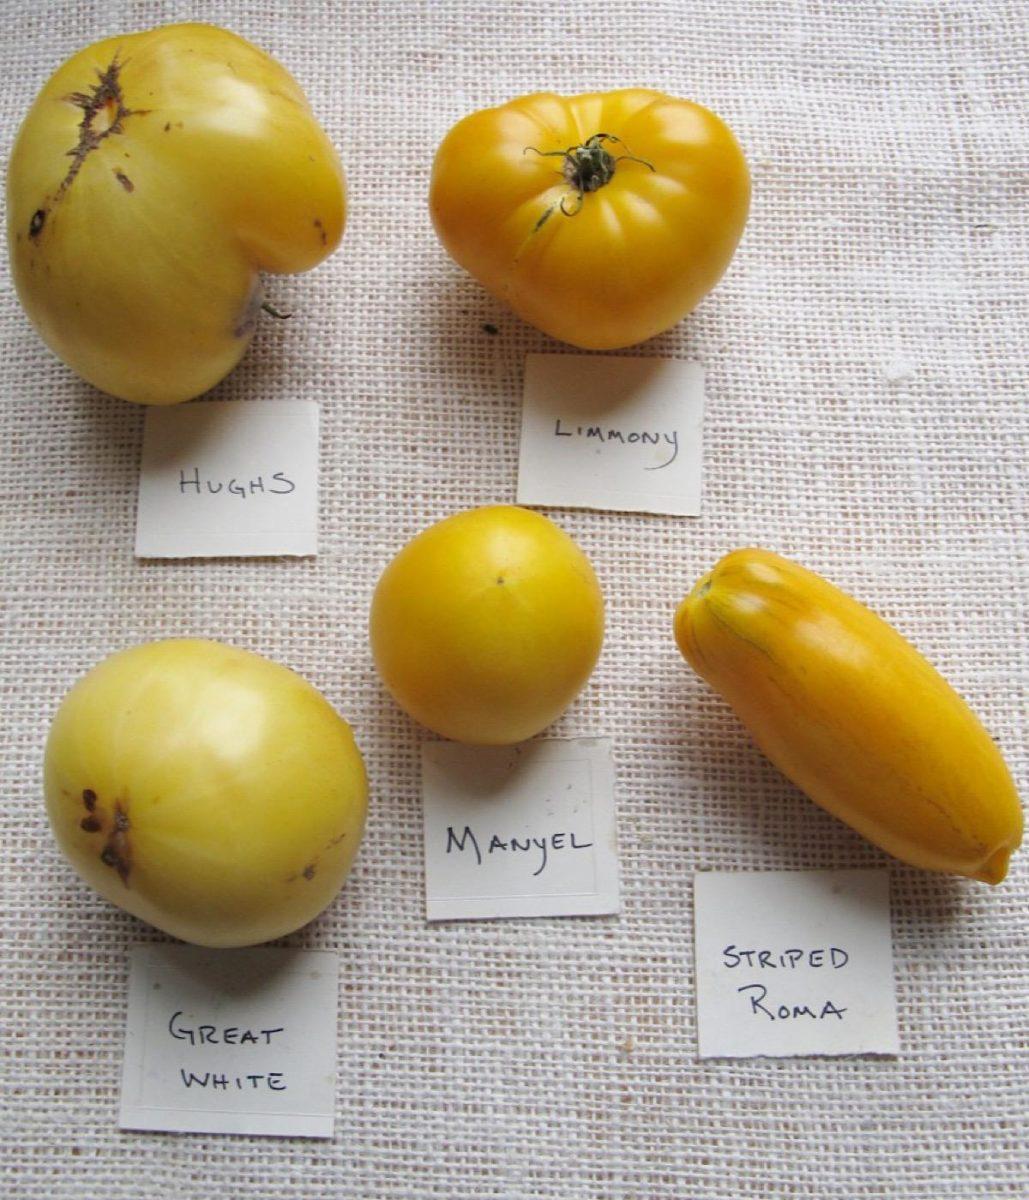 Four popular yellow varieties of heirloom tomatoes